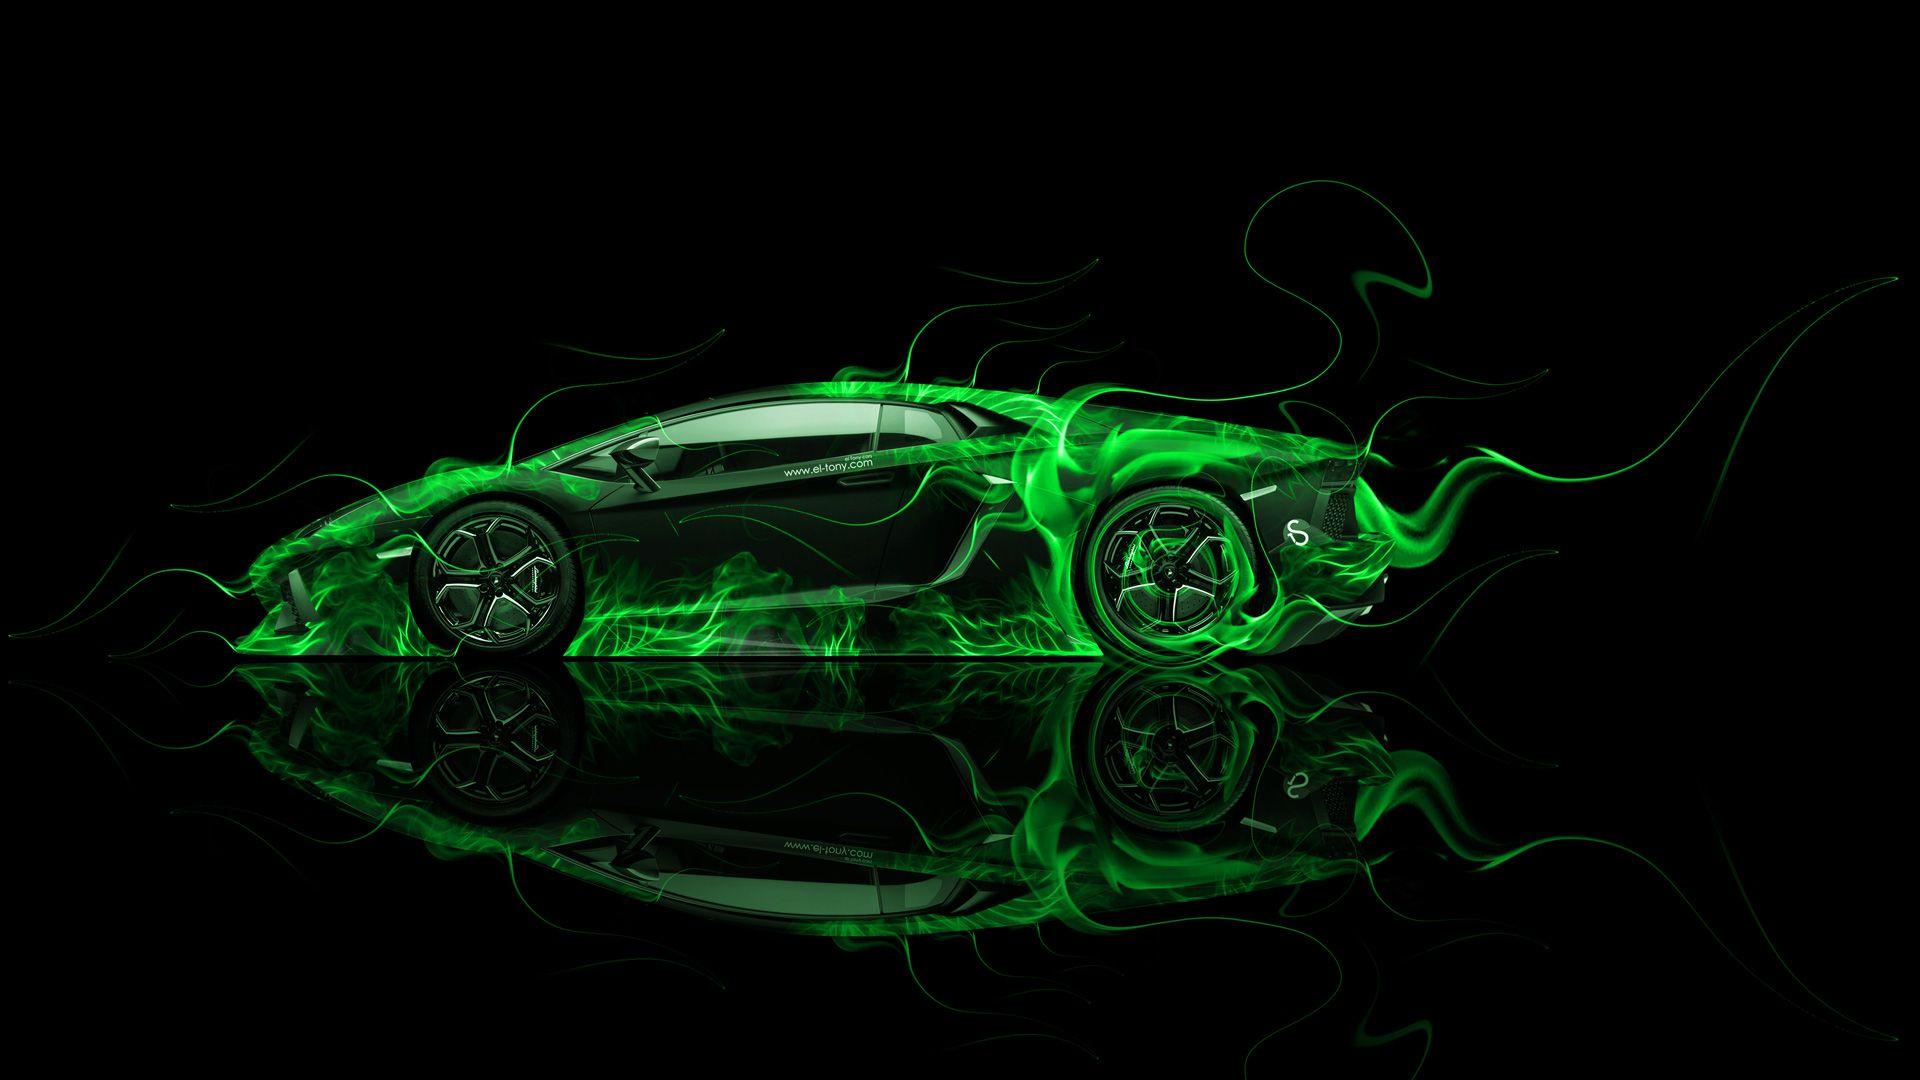 Lovely Lamborghini Aventador Side Green Fire Abstract Car 2014 HD Wallpapers Design By Tony Kokhan Www.el Tony.com_  (1920×1080)